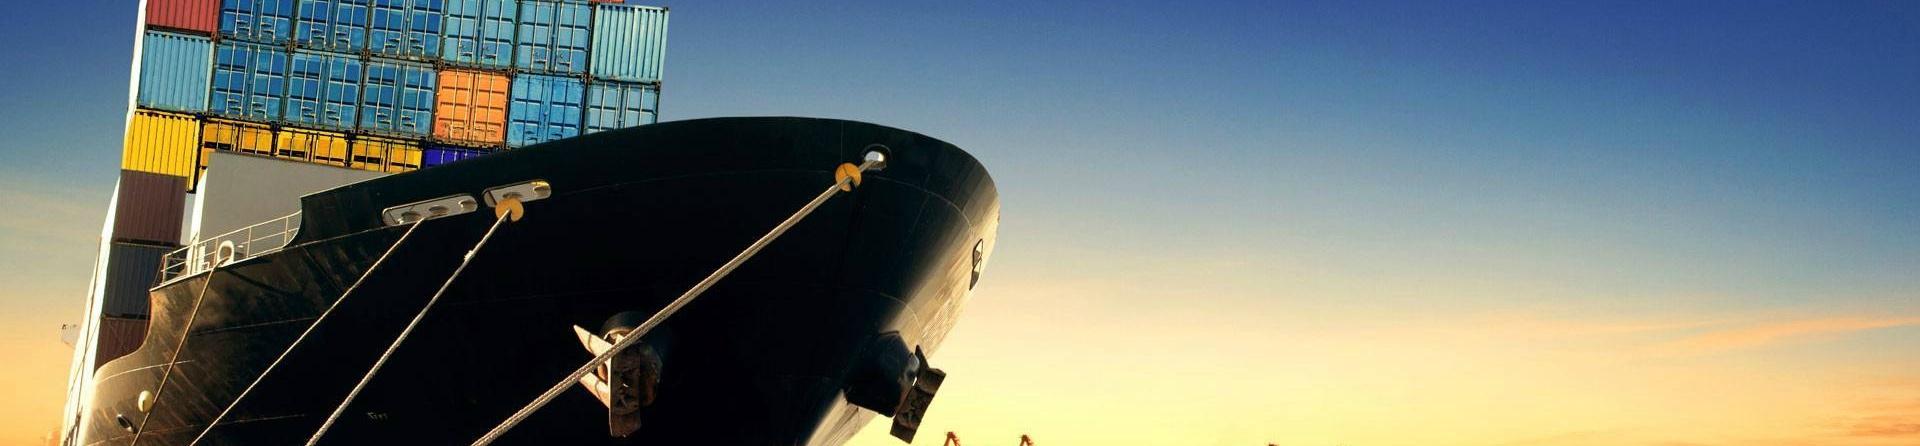 A smart ship in cargo.